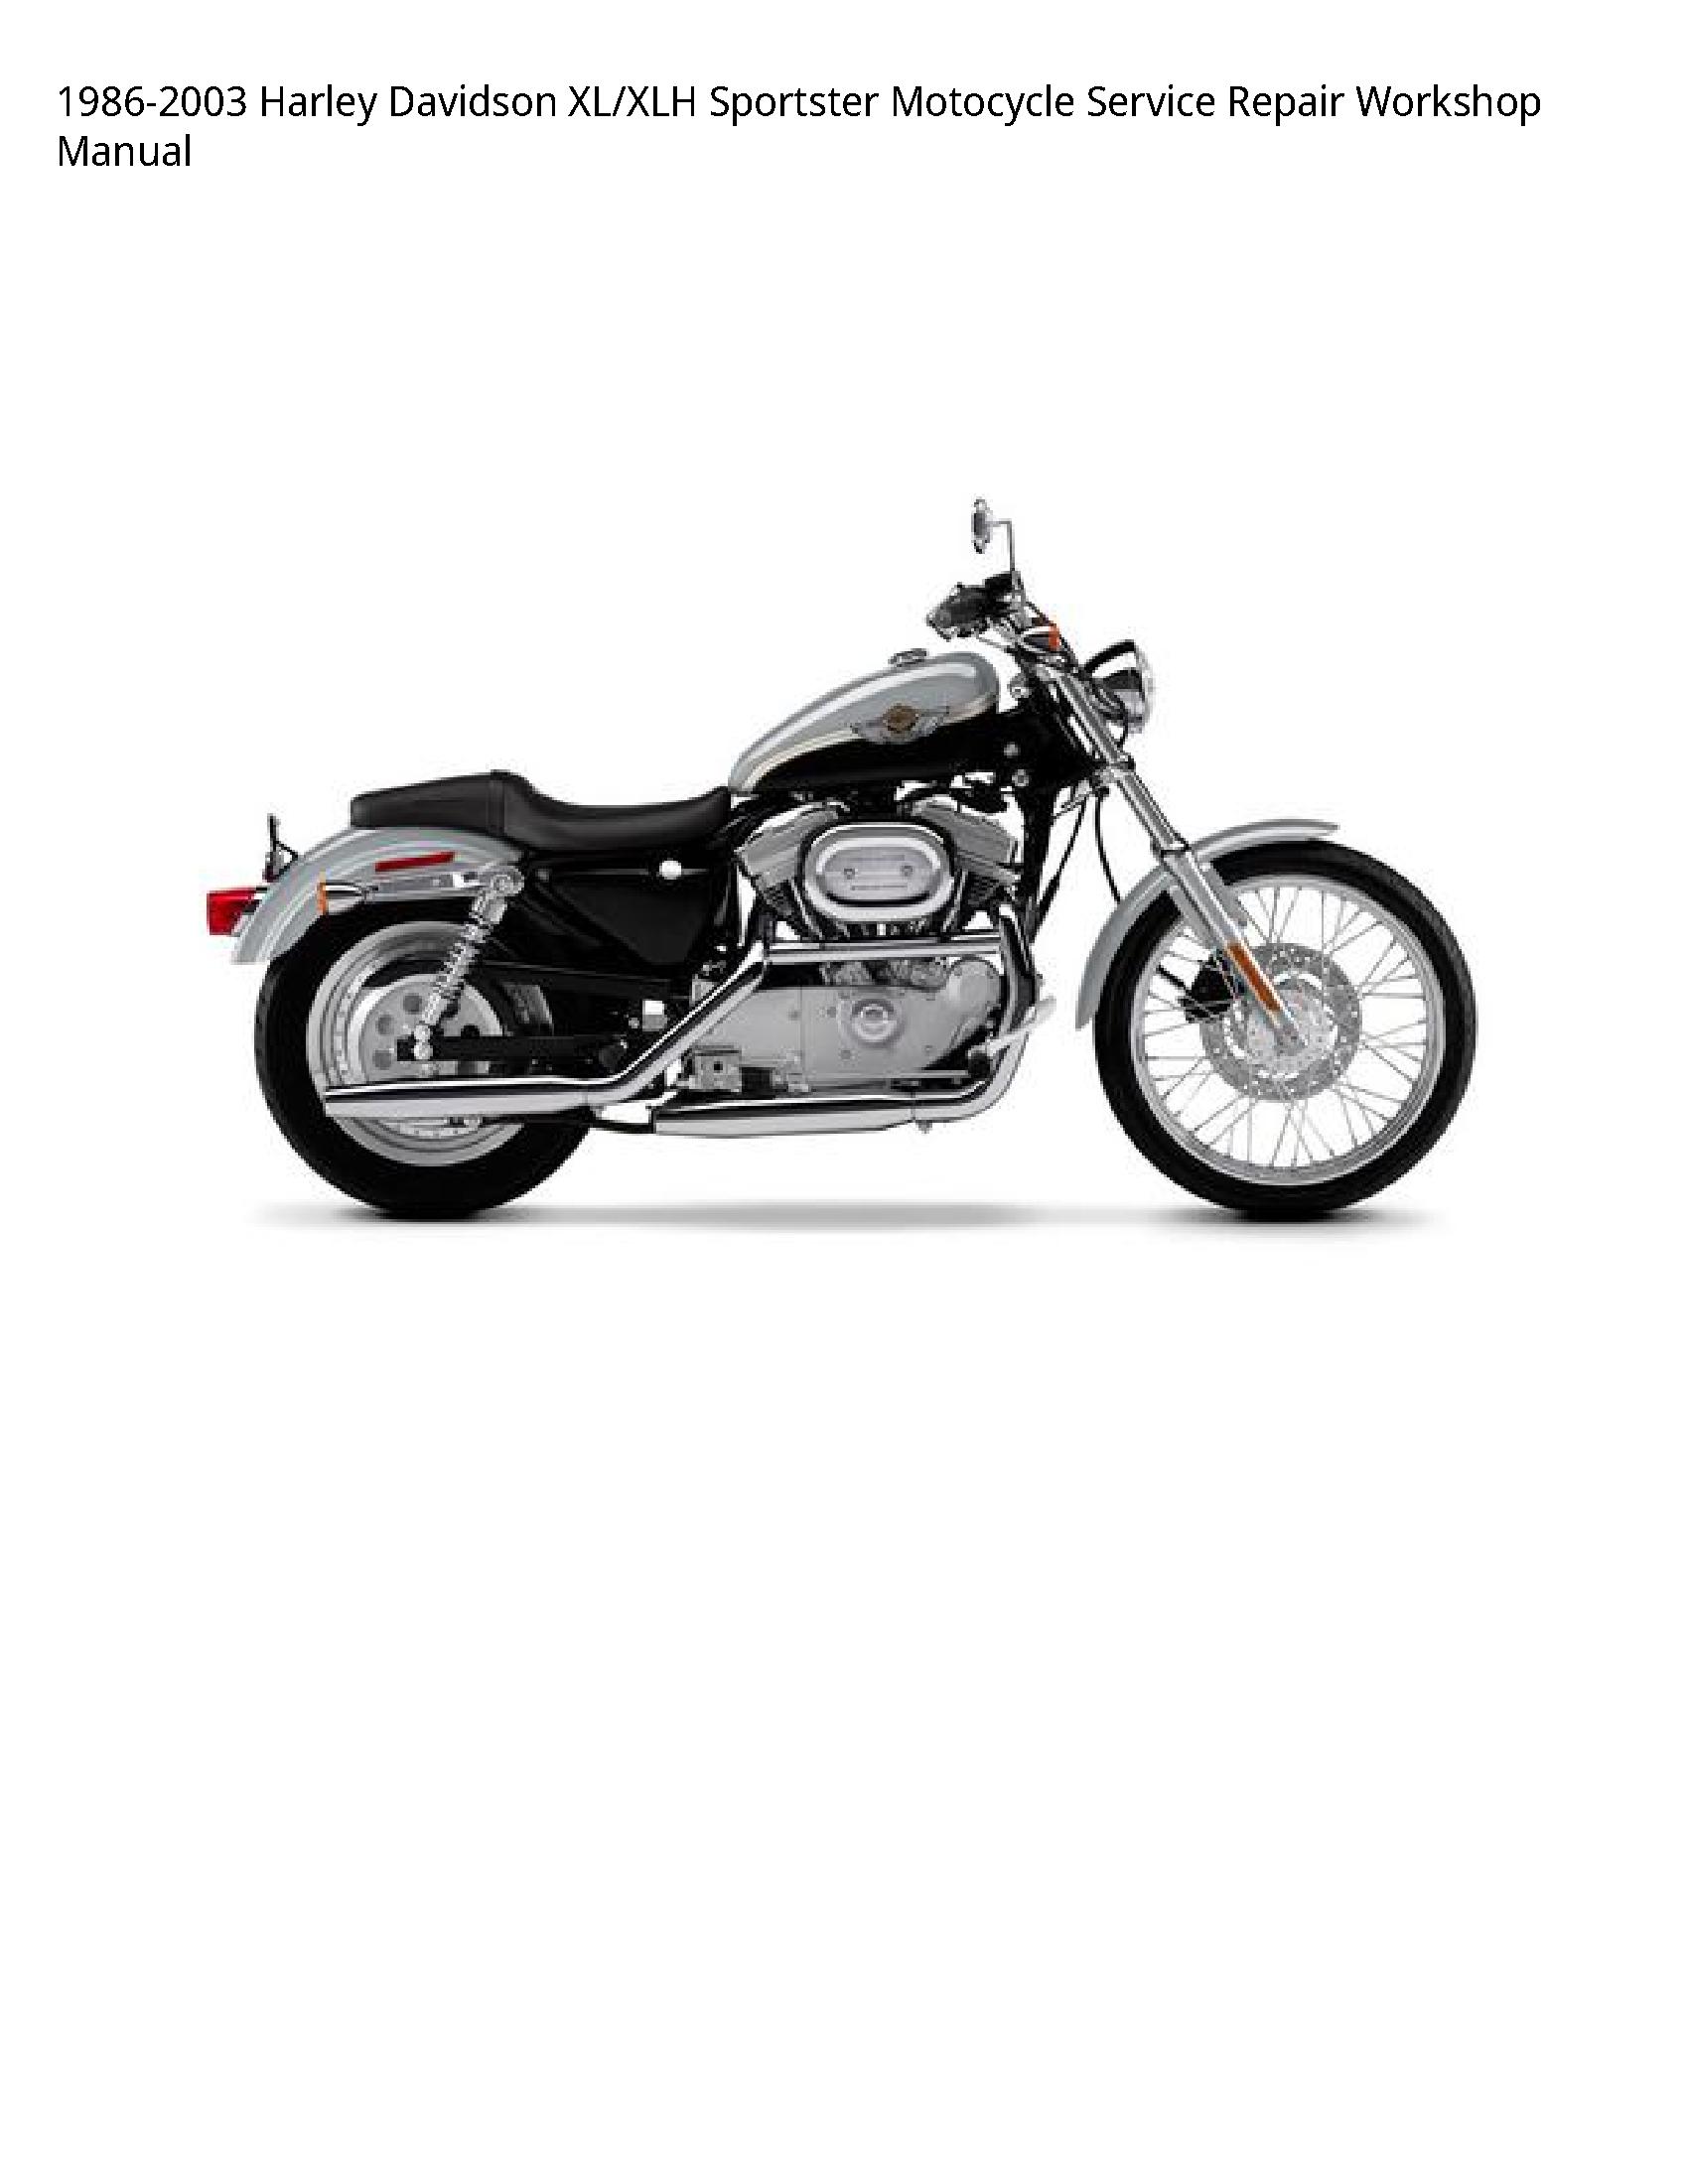 Harley Davidson XL/XLH Sportster Motocycle manual